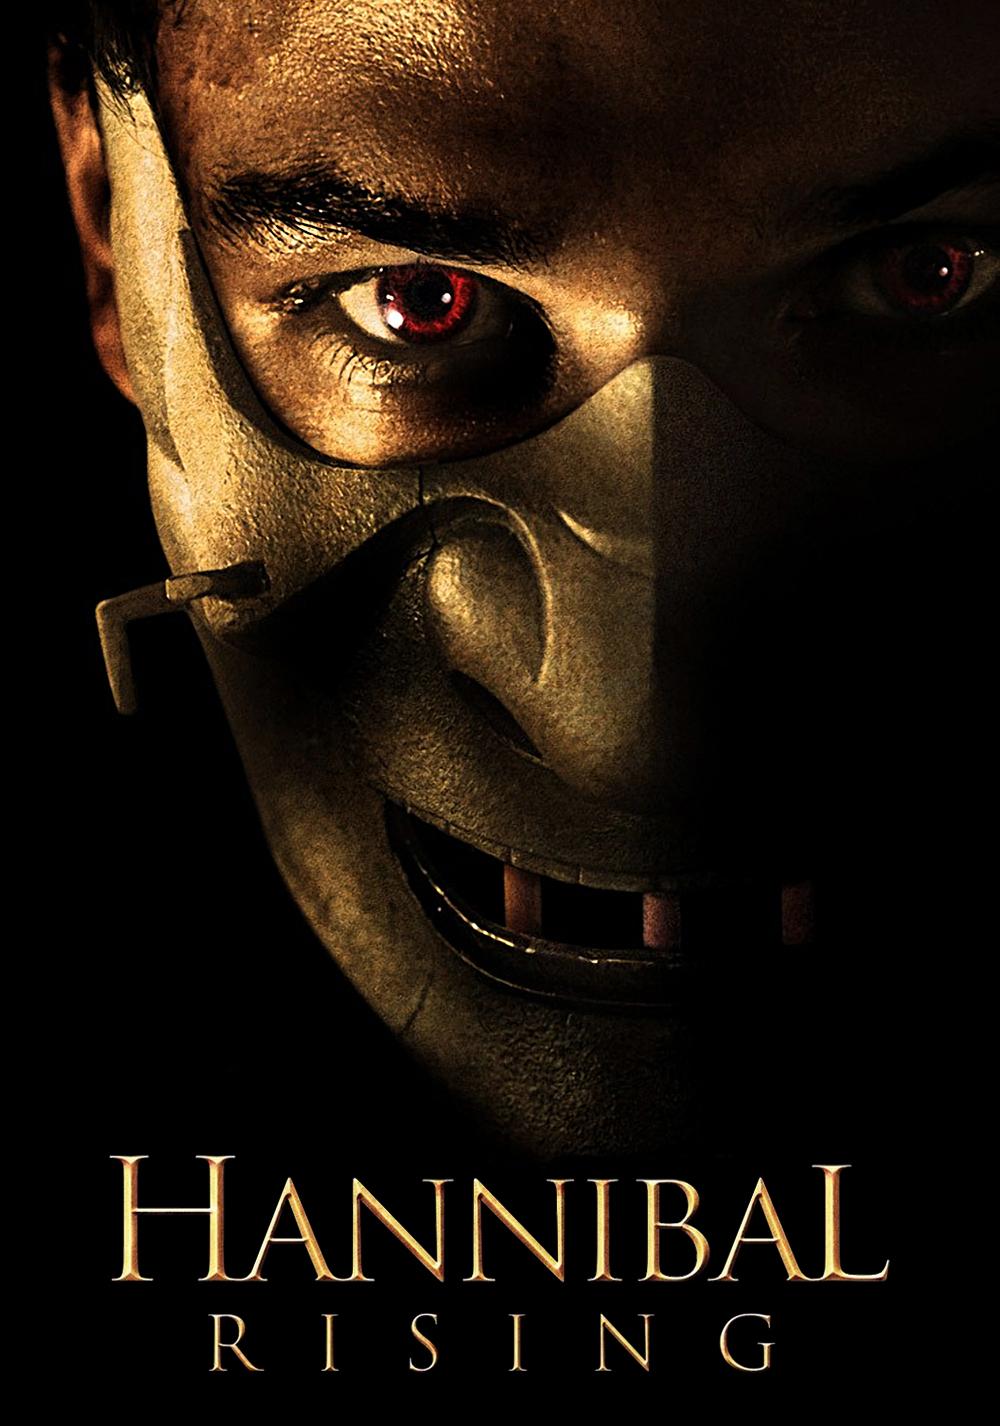 hannibal-rising-535dcc43eaa4d.jpg